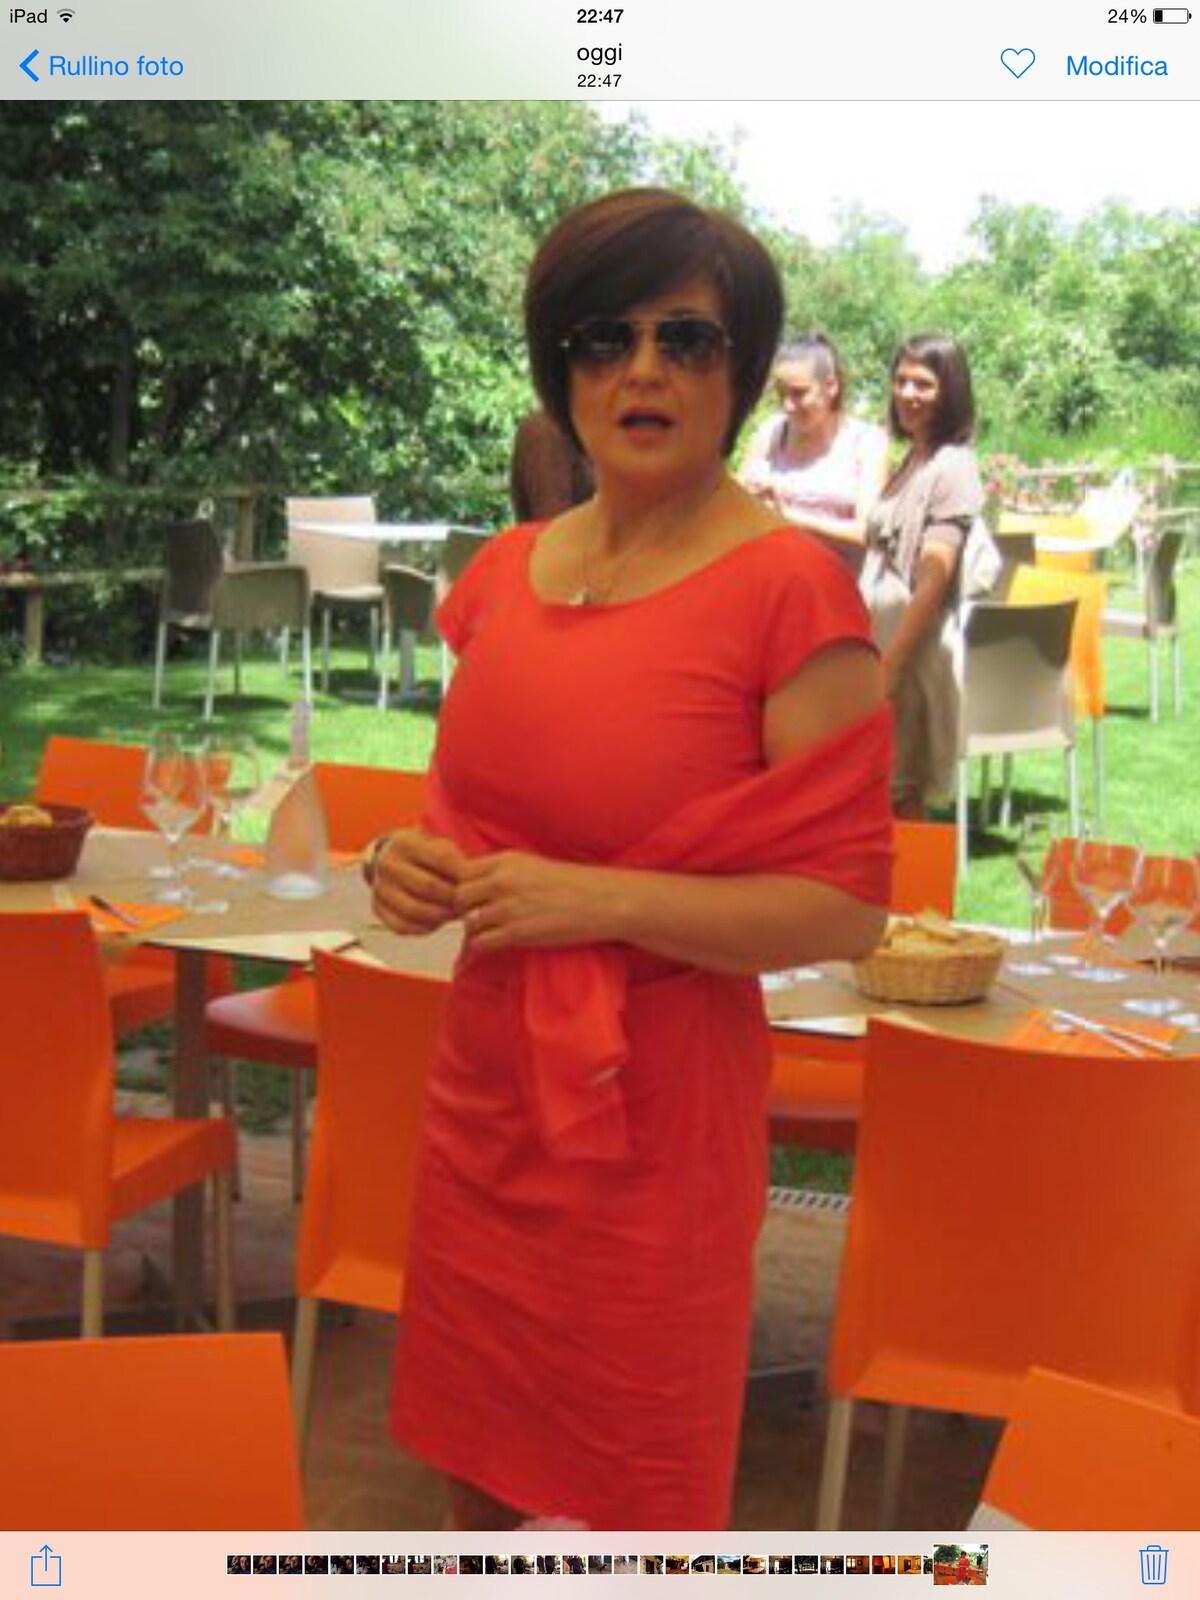 Antonella from Orvieto